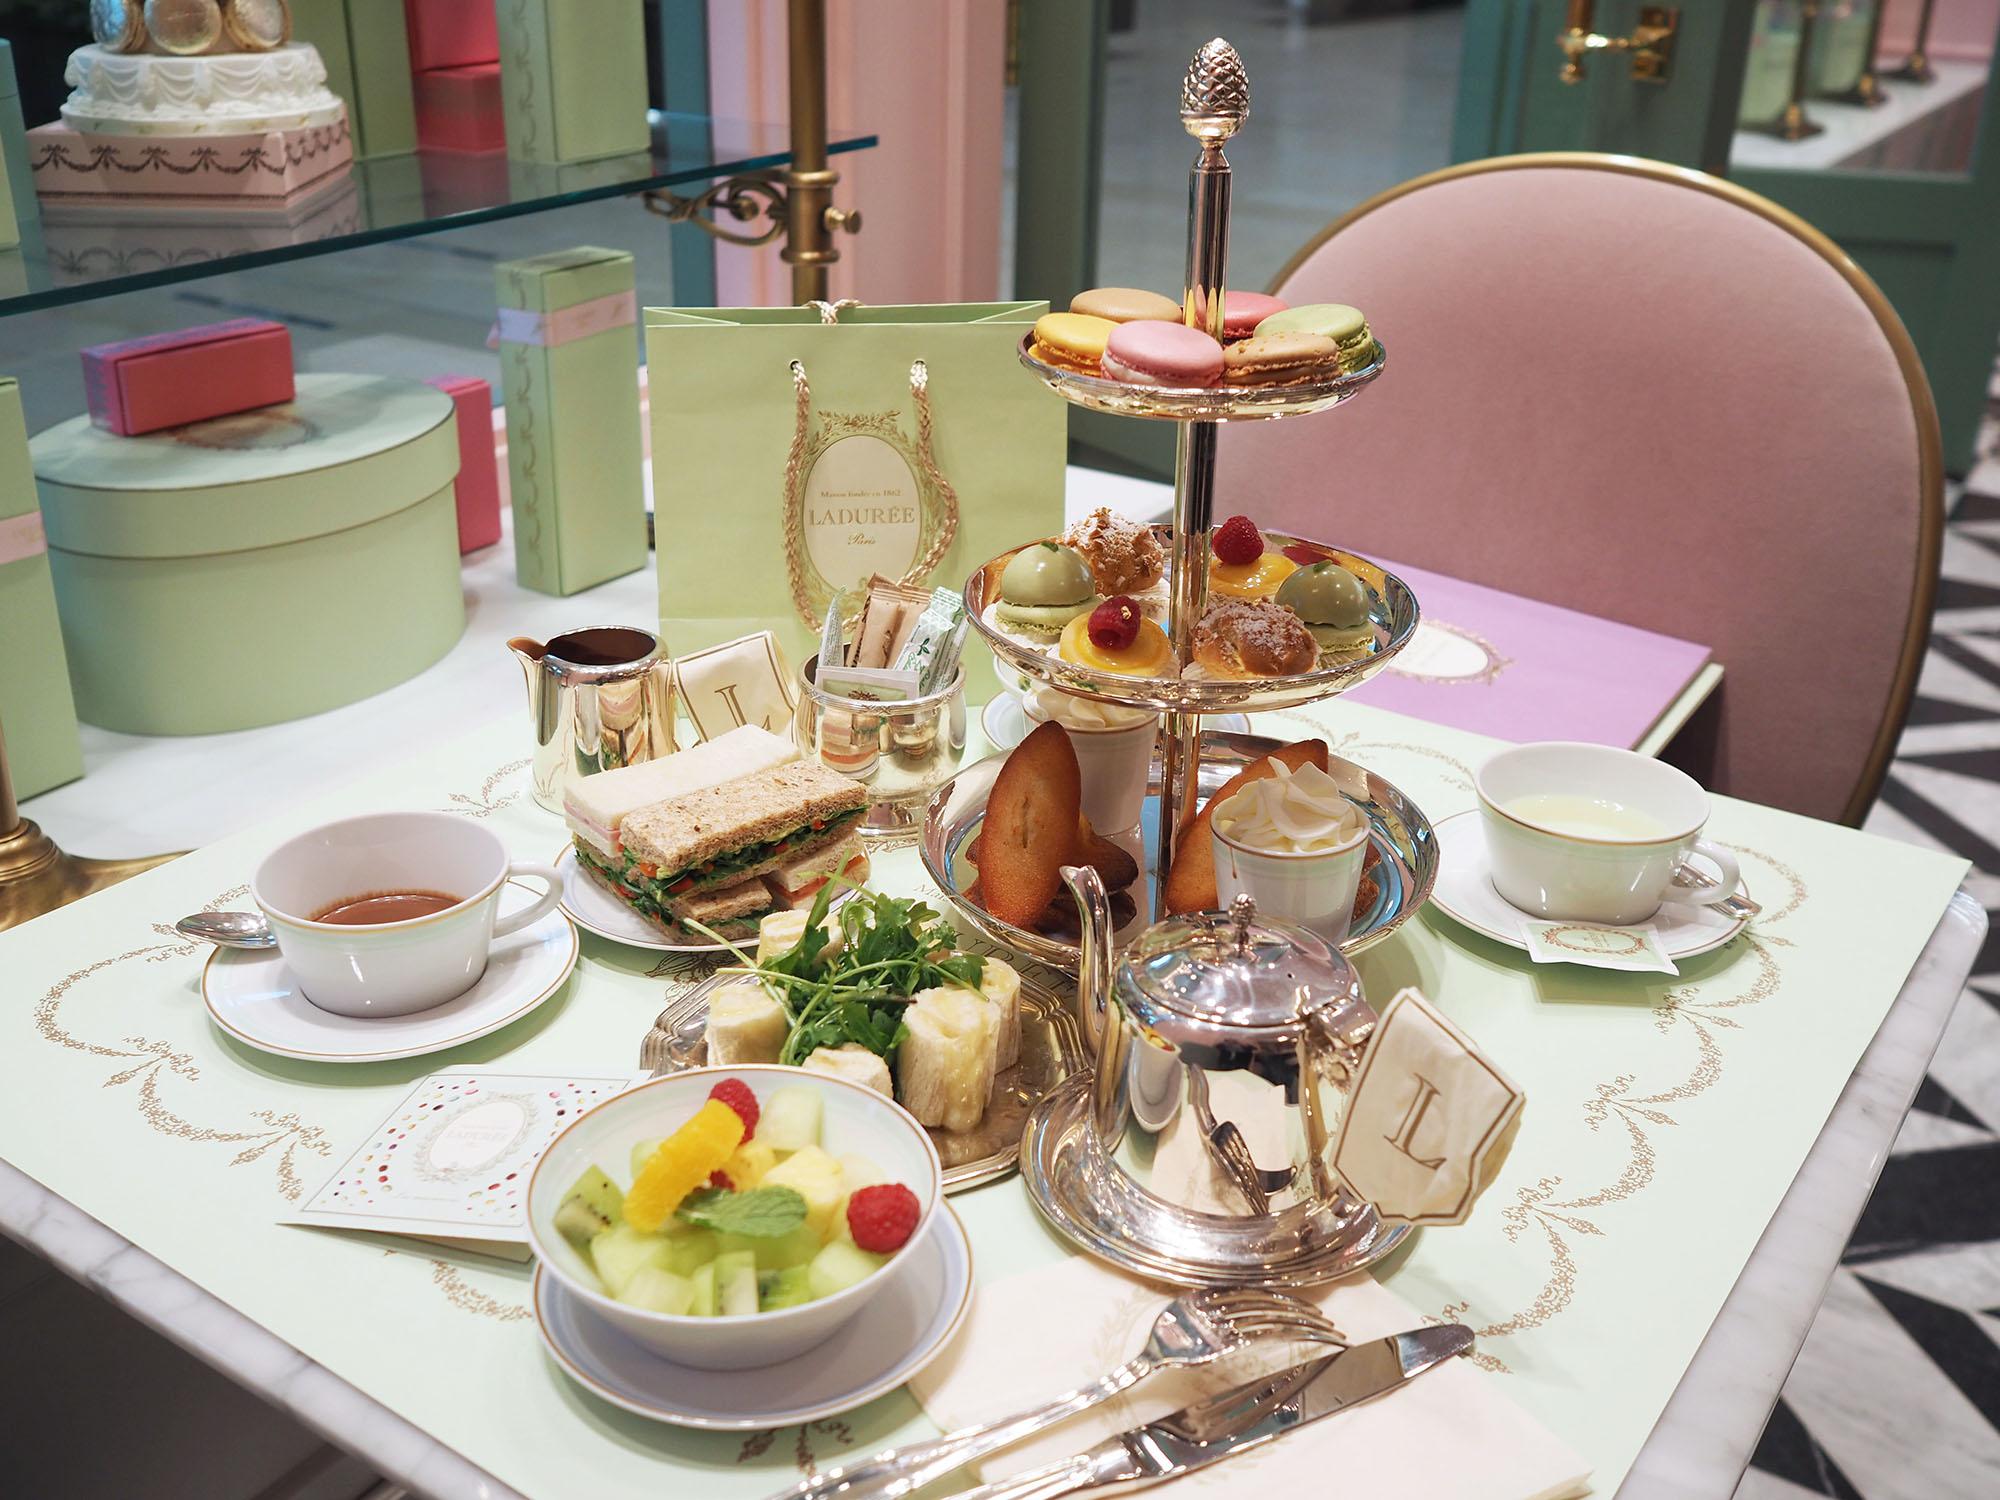 Macarons and Afternoon Tea at Ladurée Yorkdale, Toronto